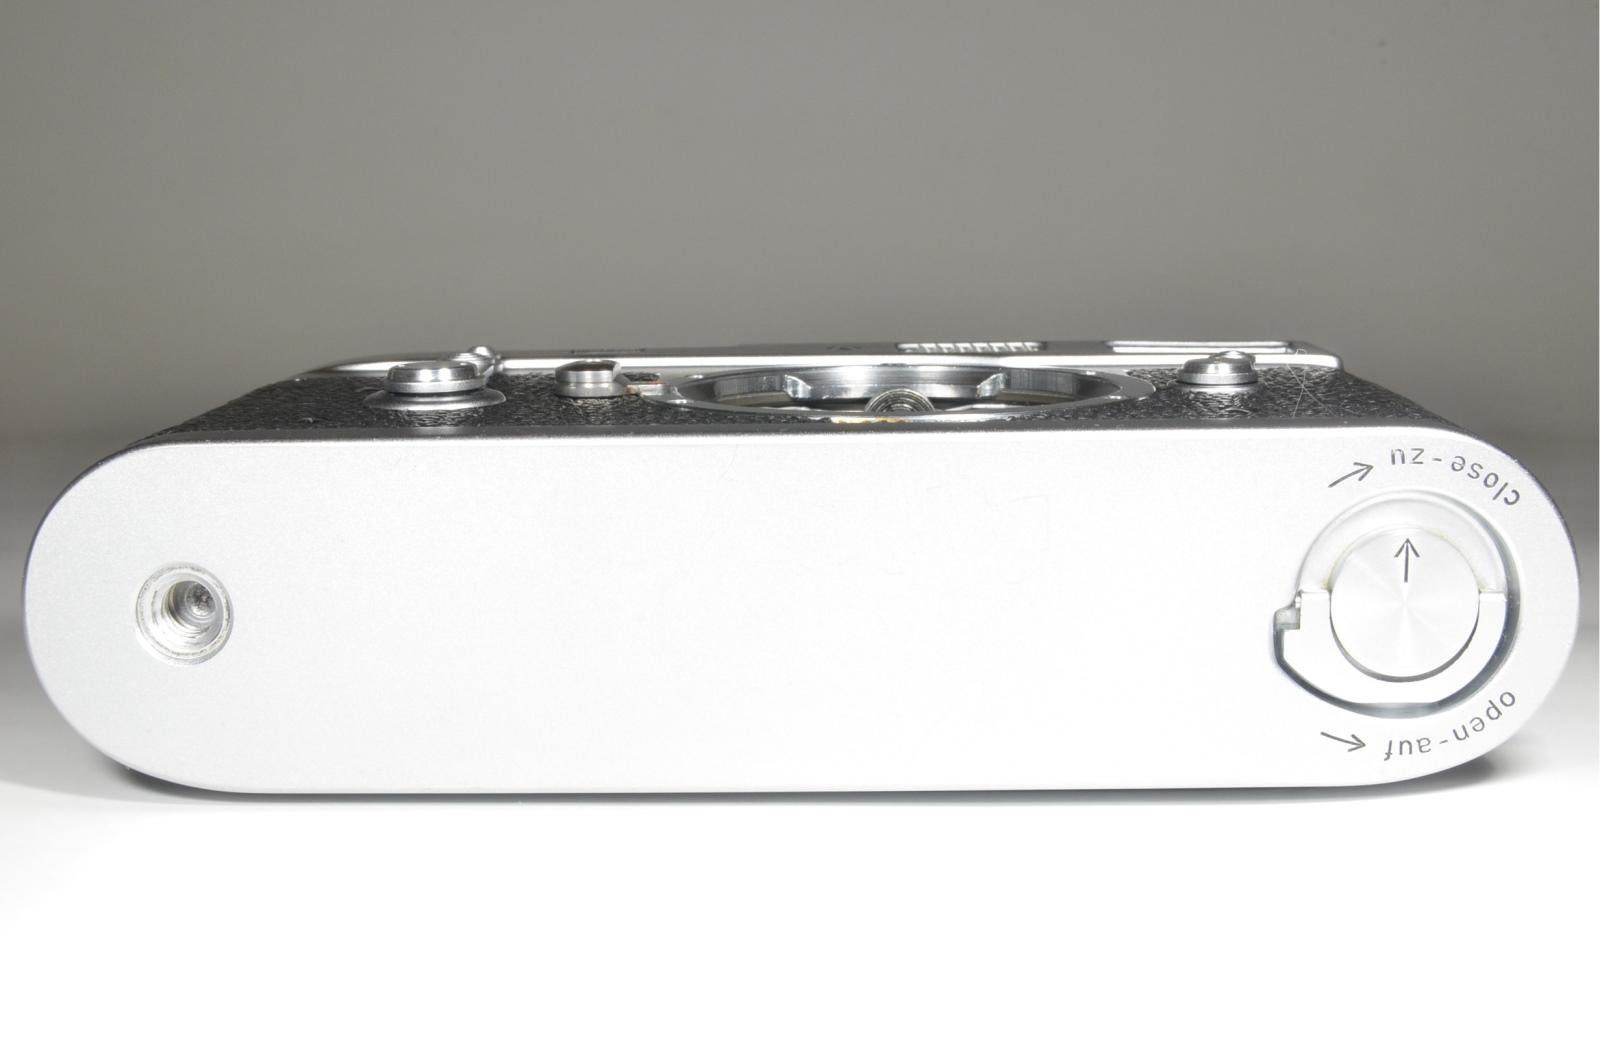 leica m2 35mm rangefinder film camera s/n 1051544 self timer